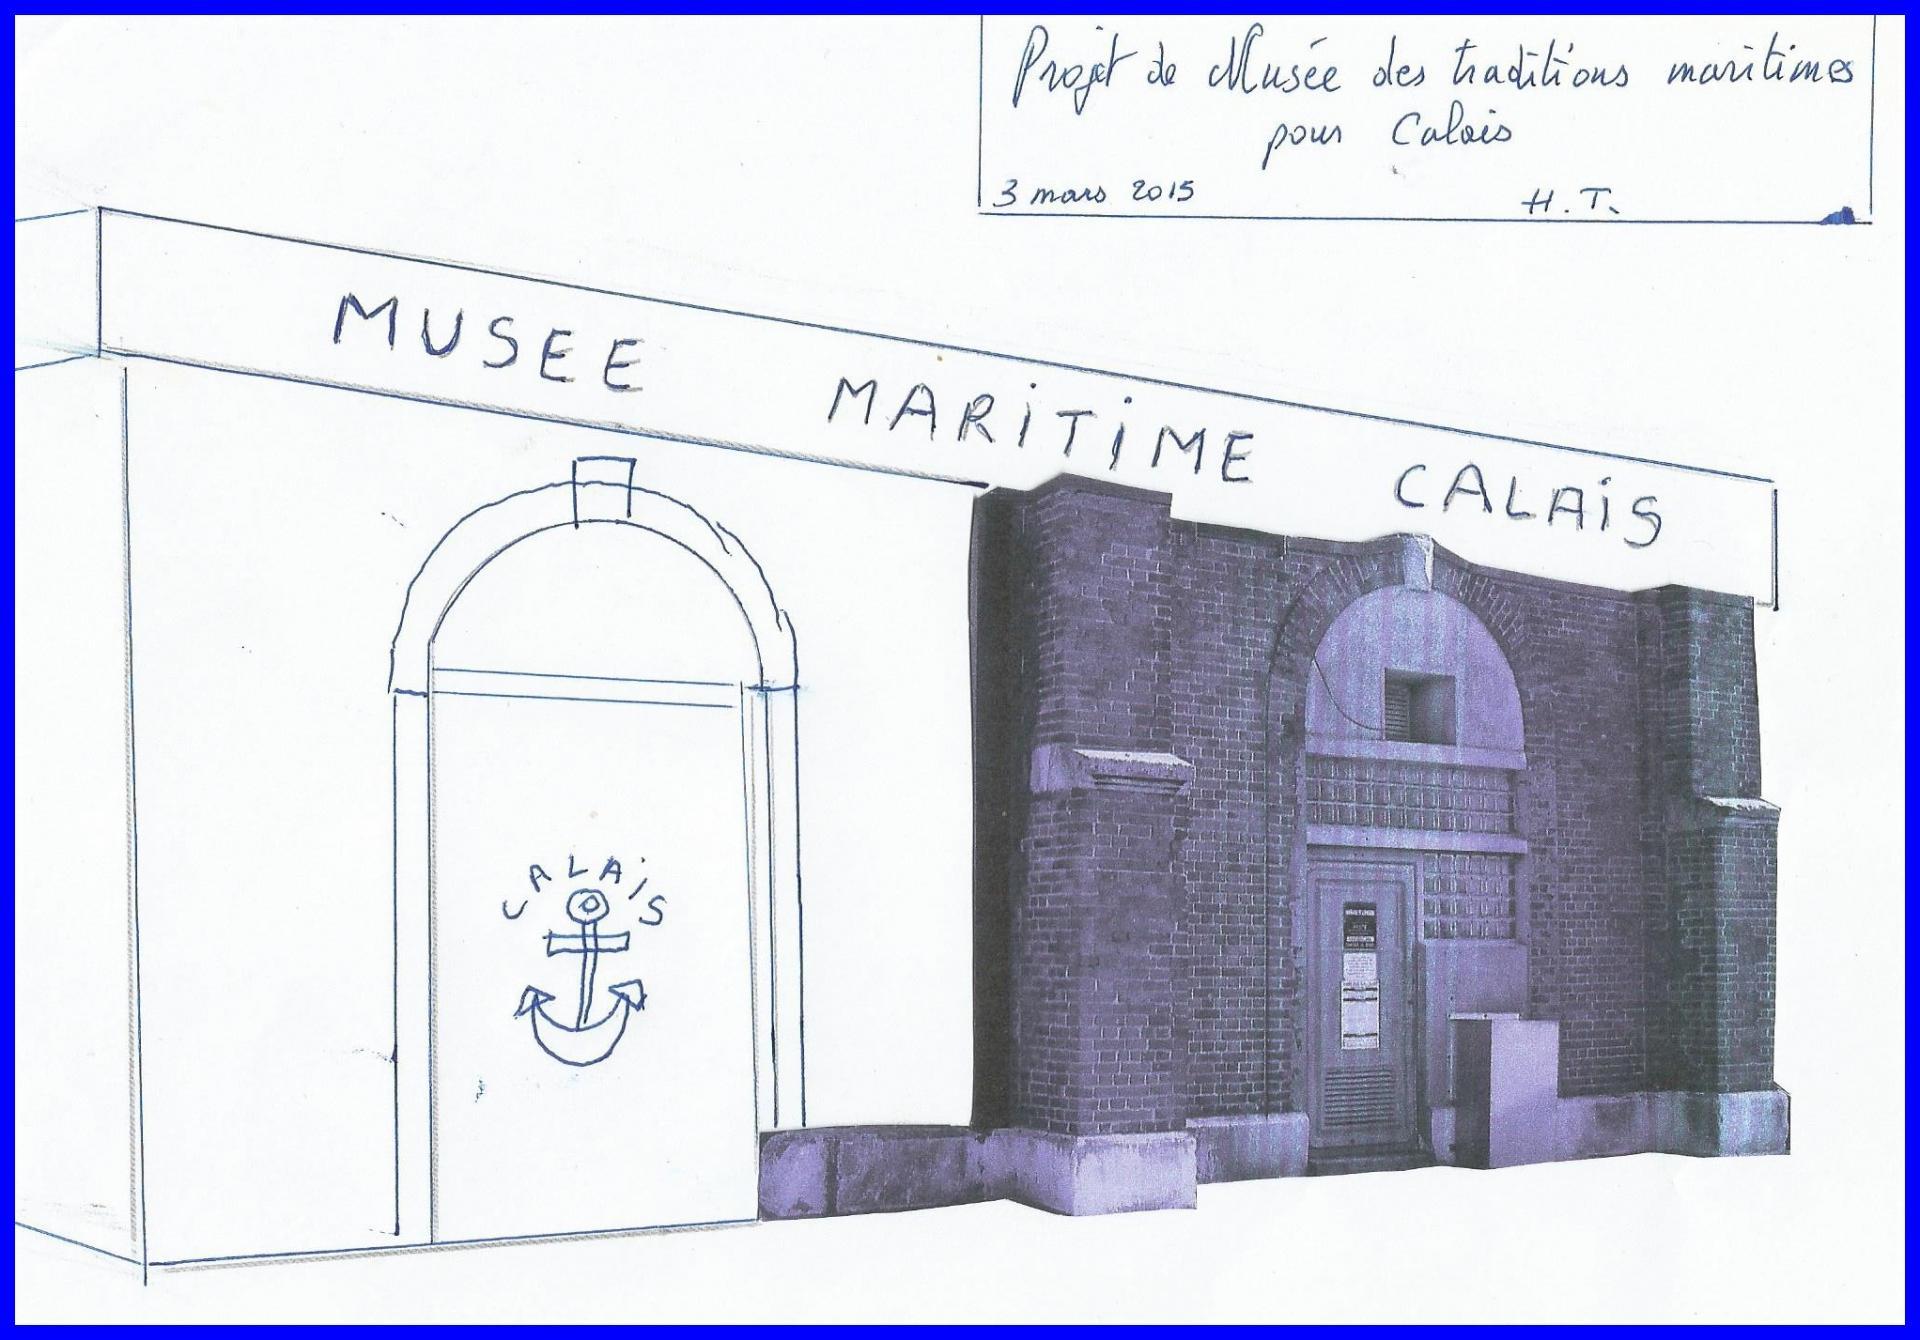 Calais projet musee maritime encadre 2